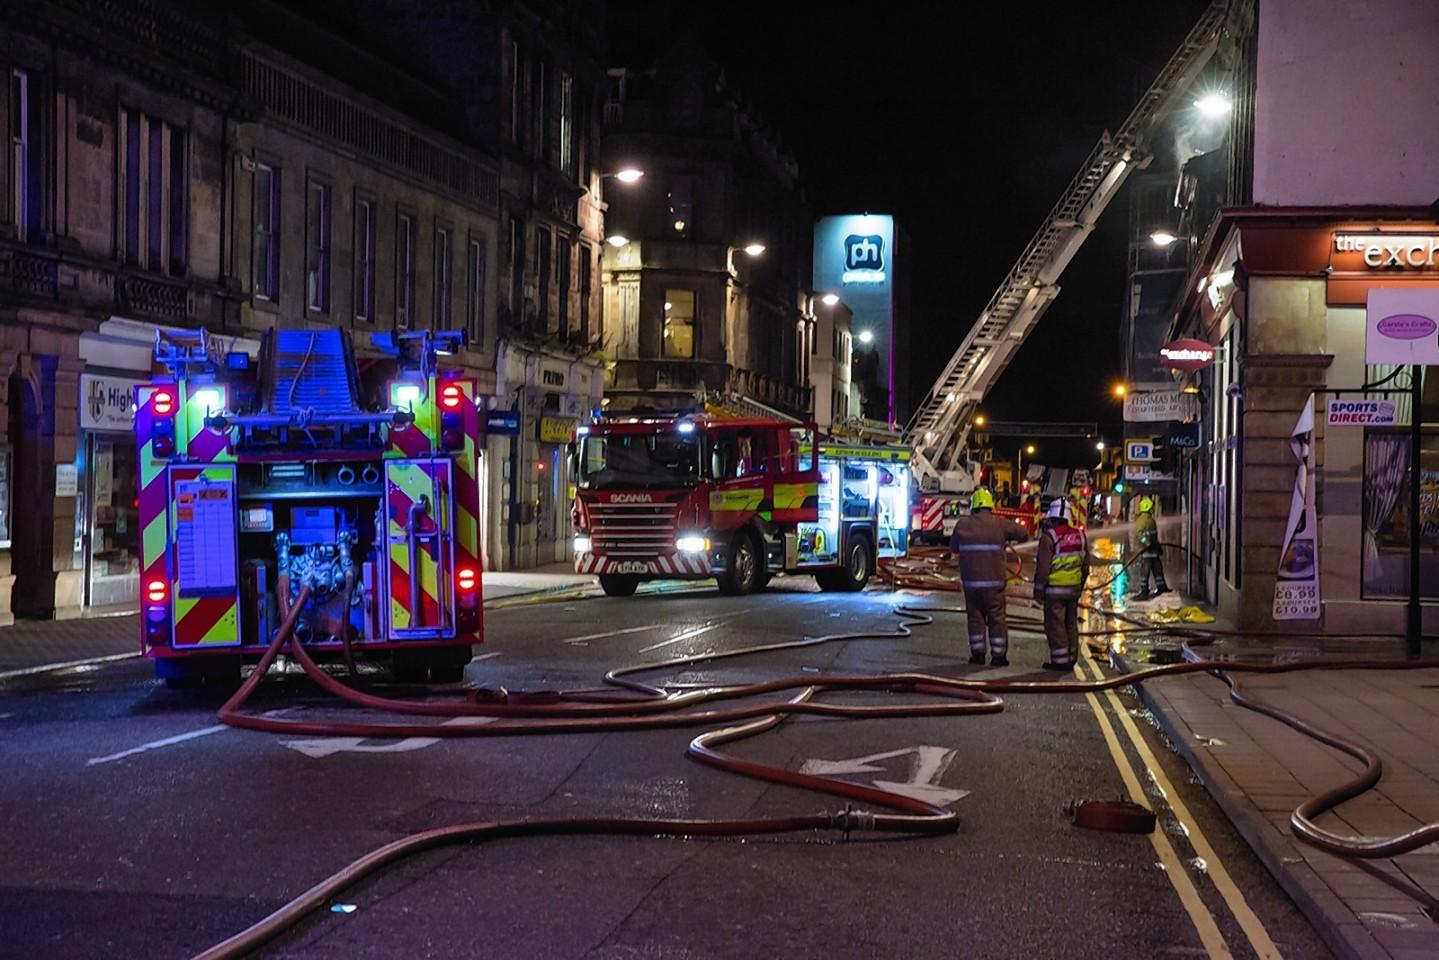 The fire on Academy Street last night